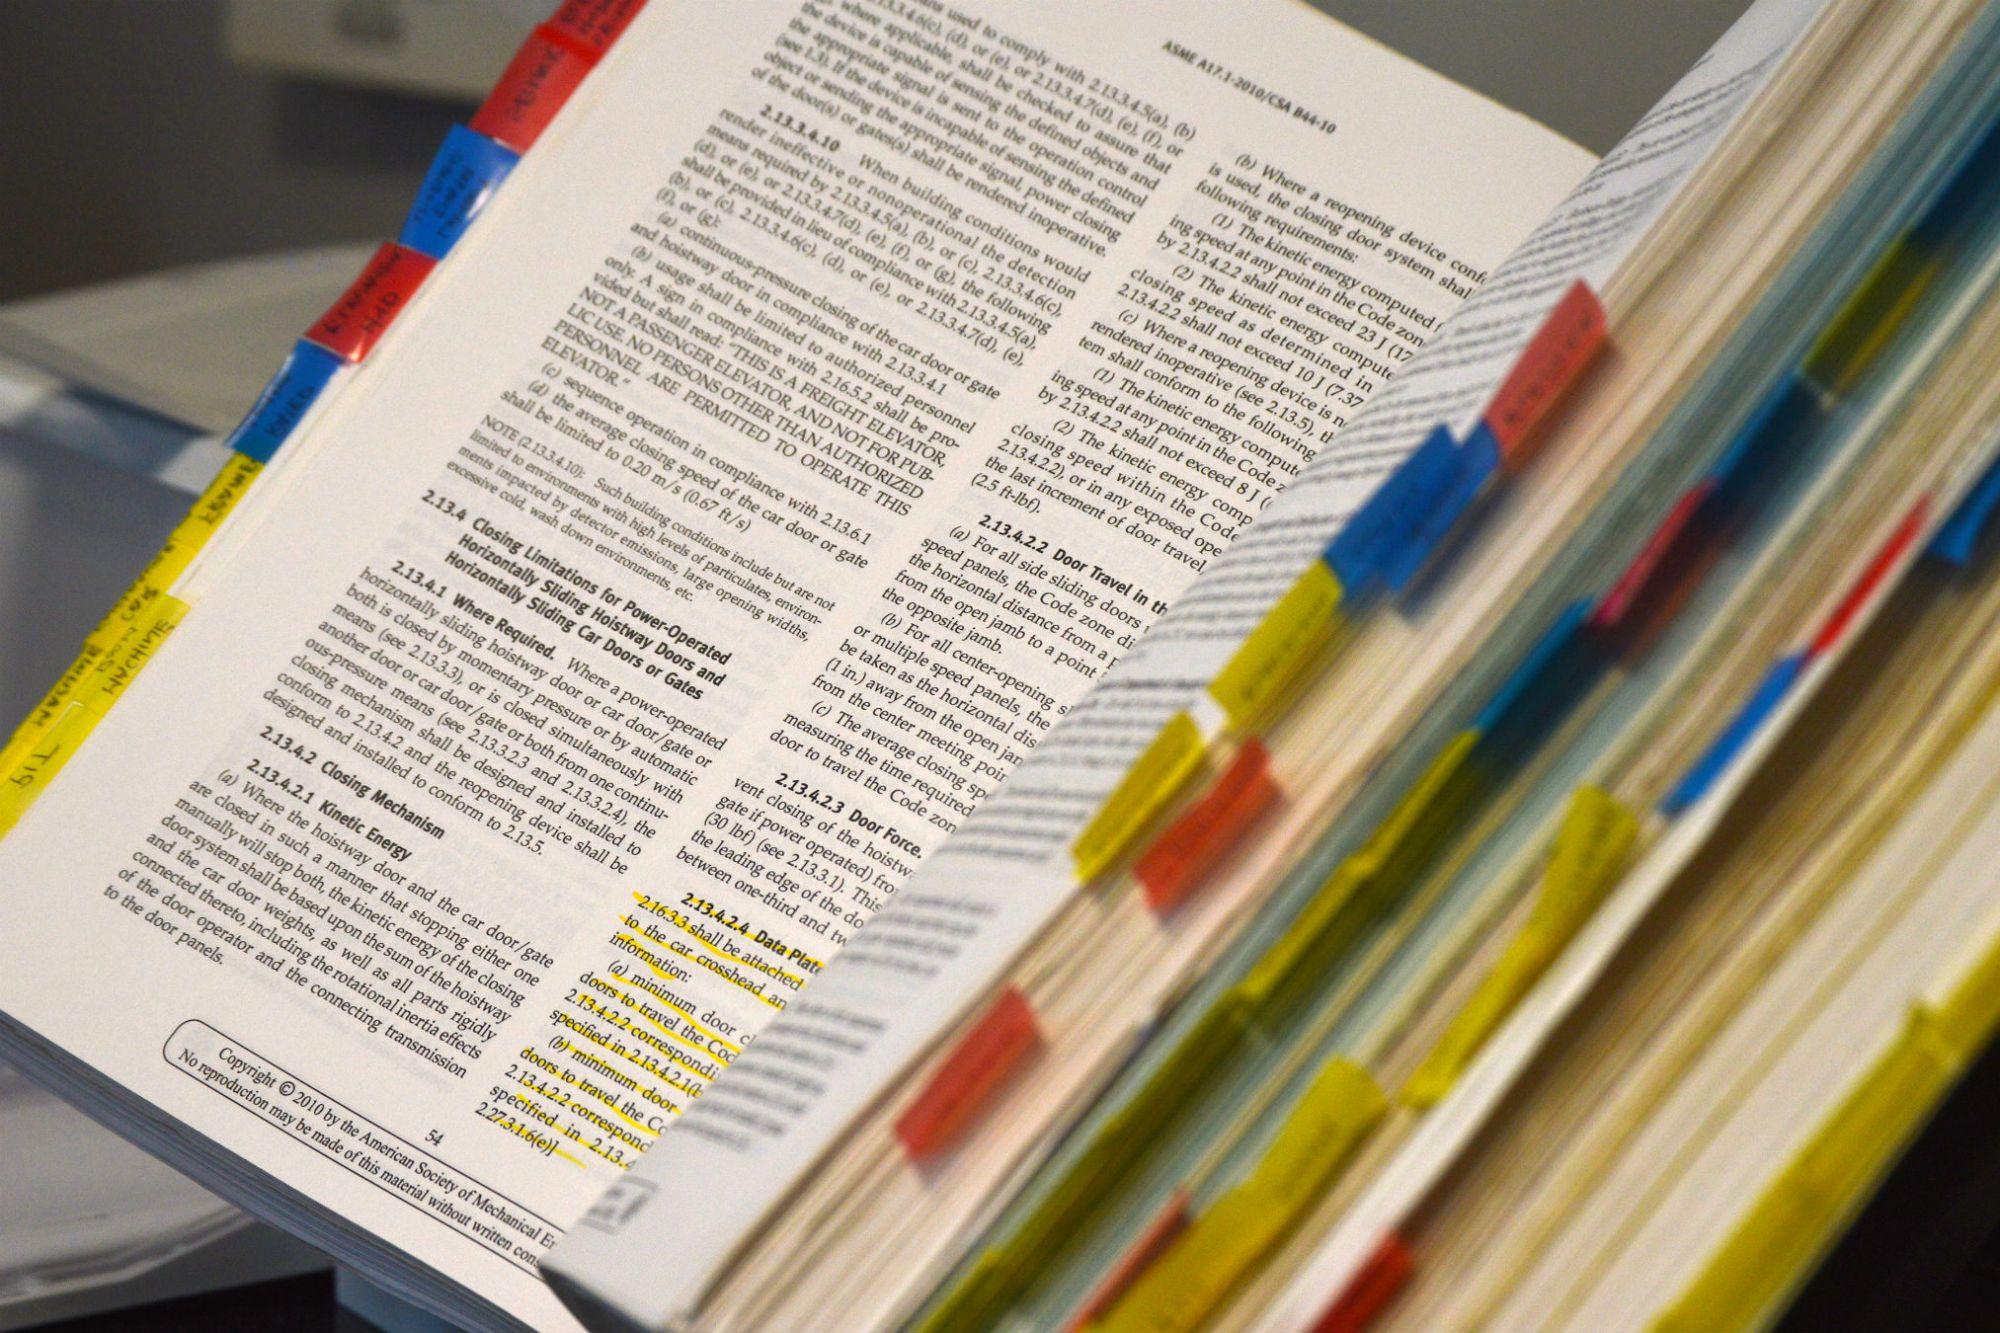 manual de uso basico del español pdf